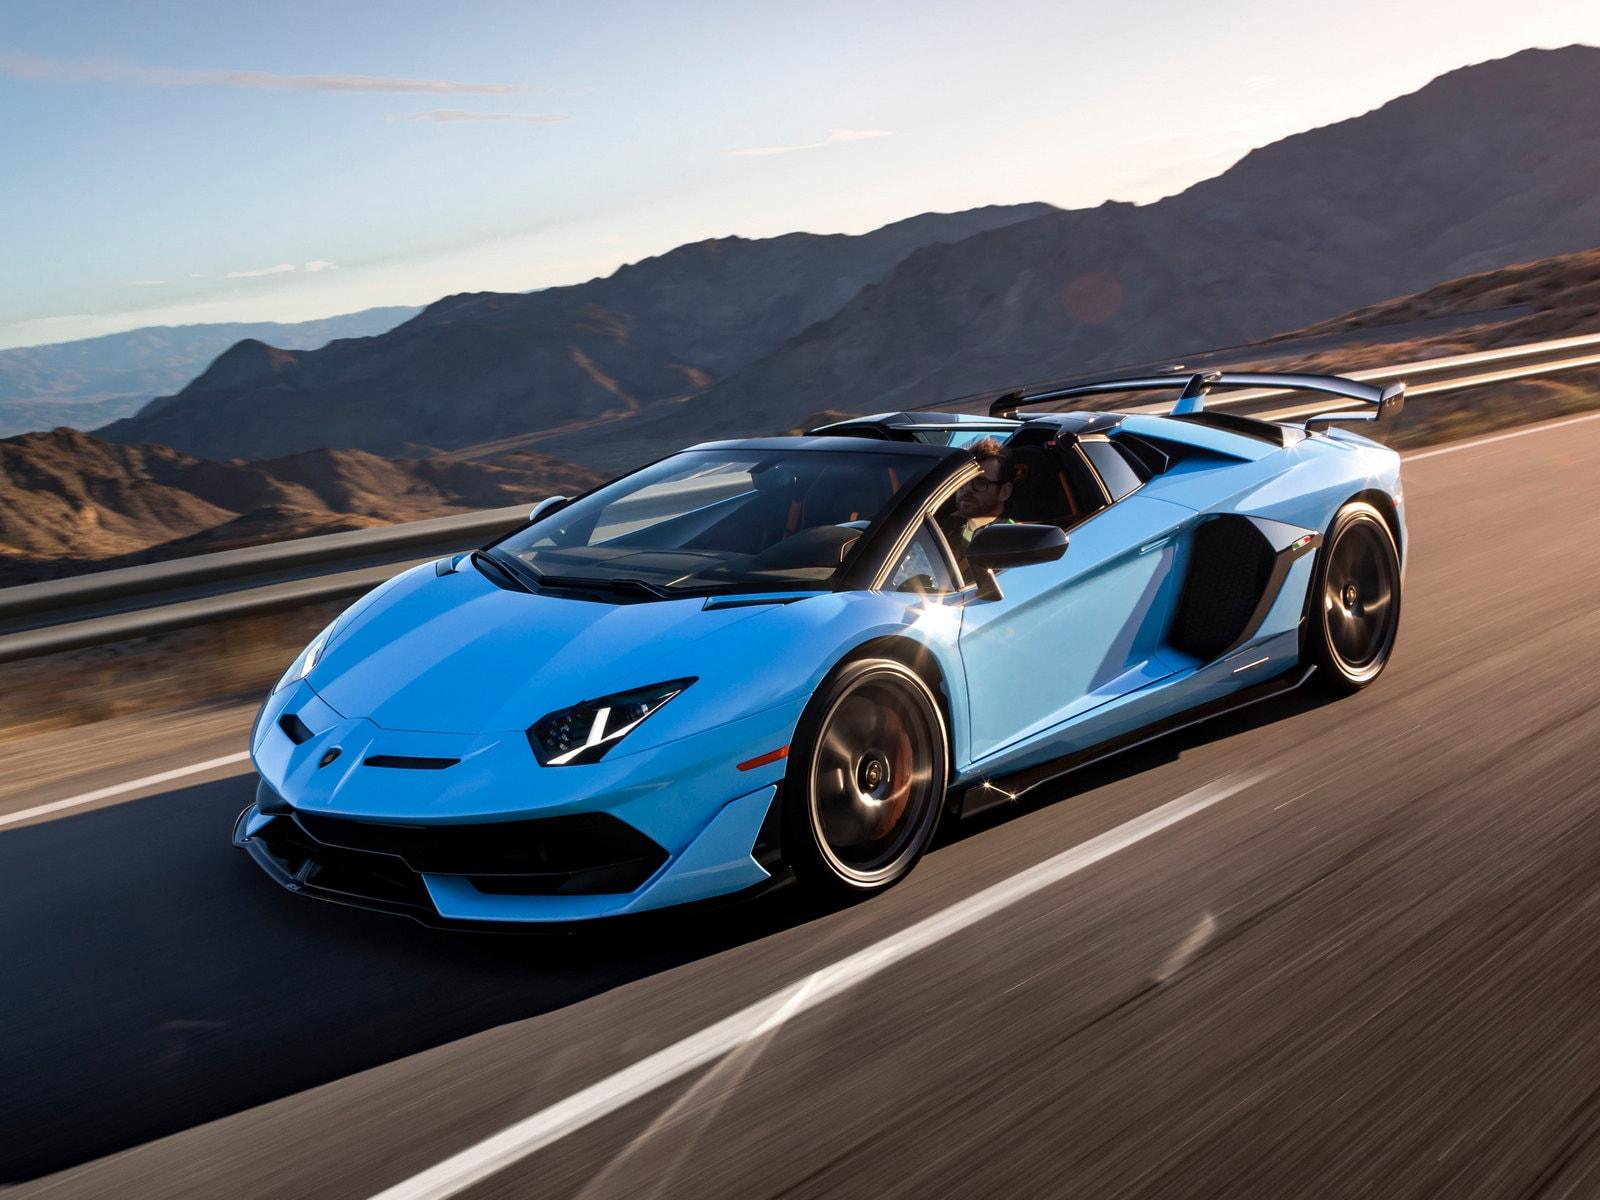 2020 lamborghini aventador svj roadster first look kelley blue book 2020 lamborghini aventador svj roadster